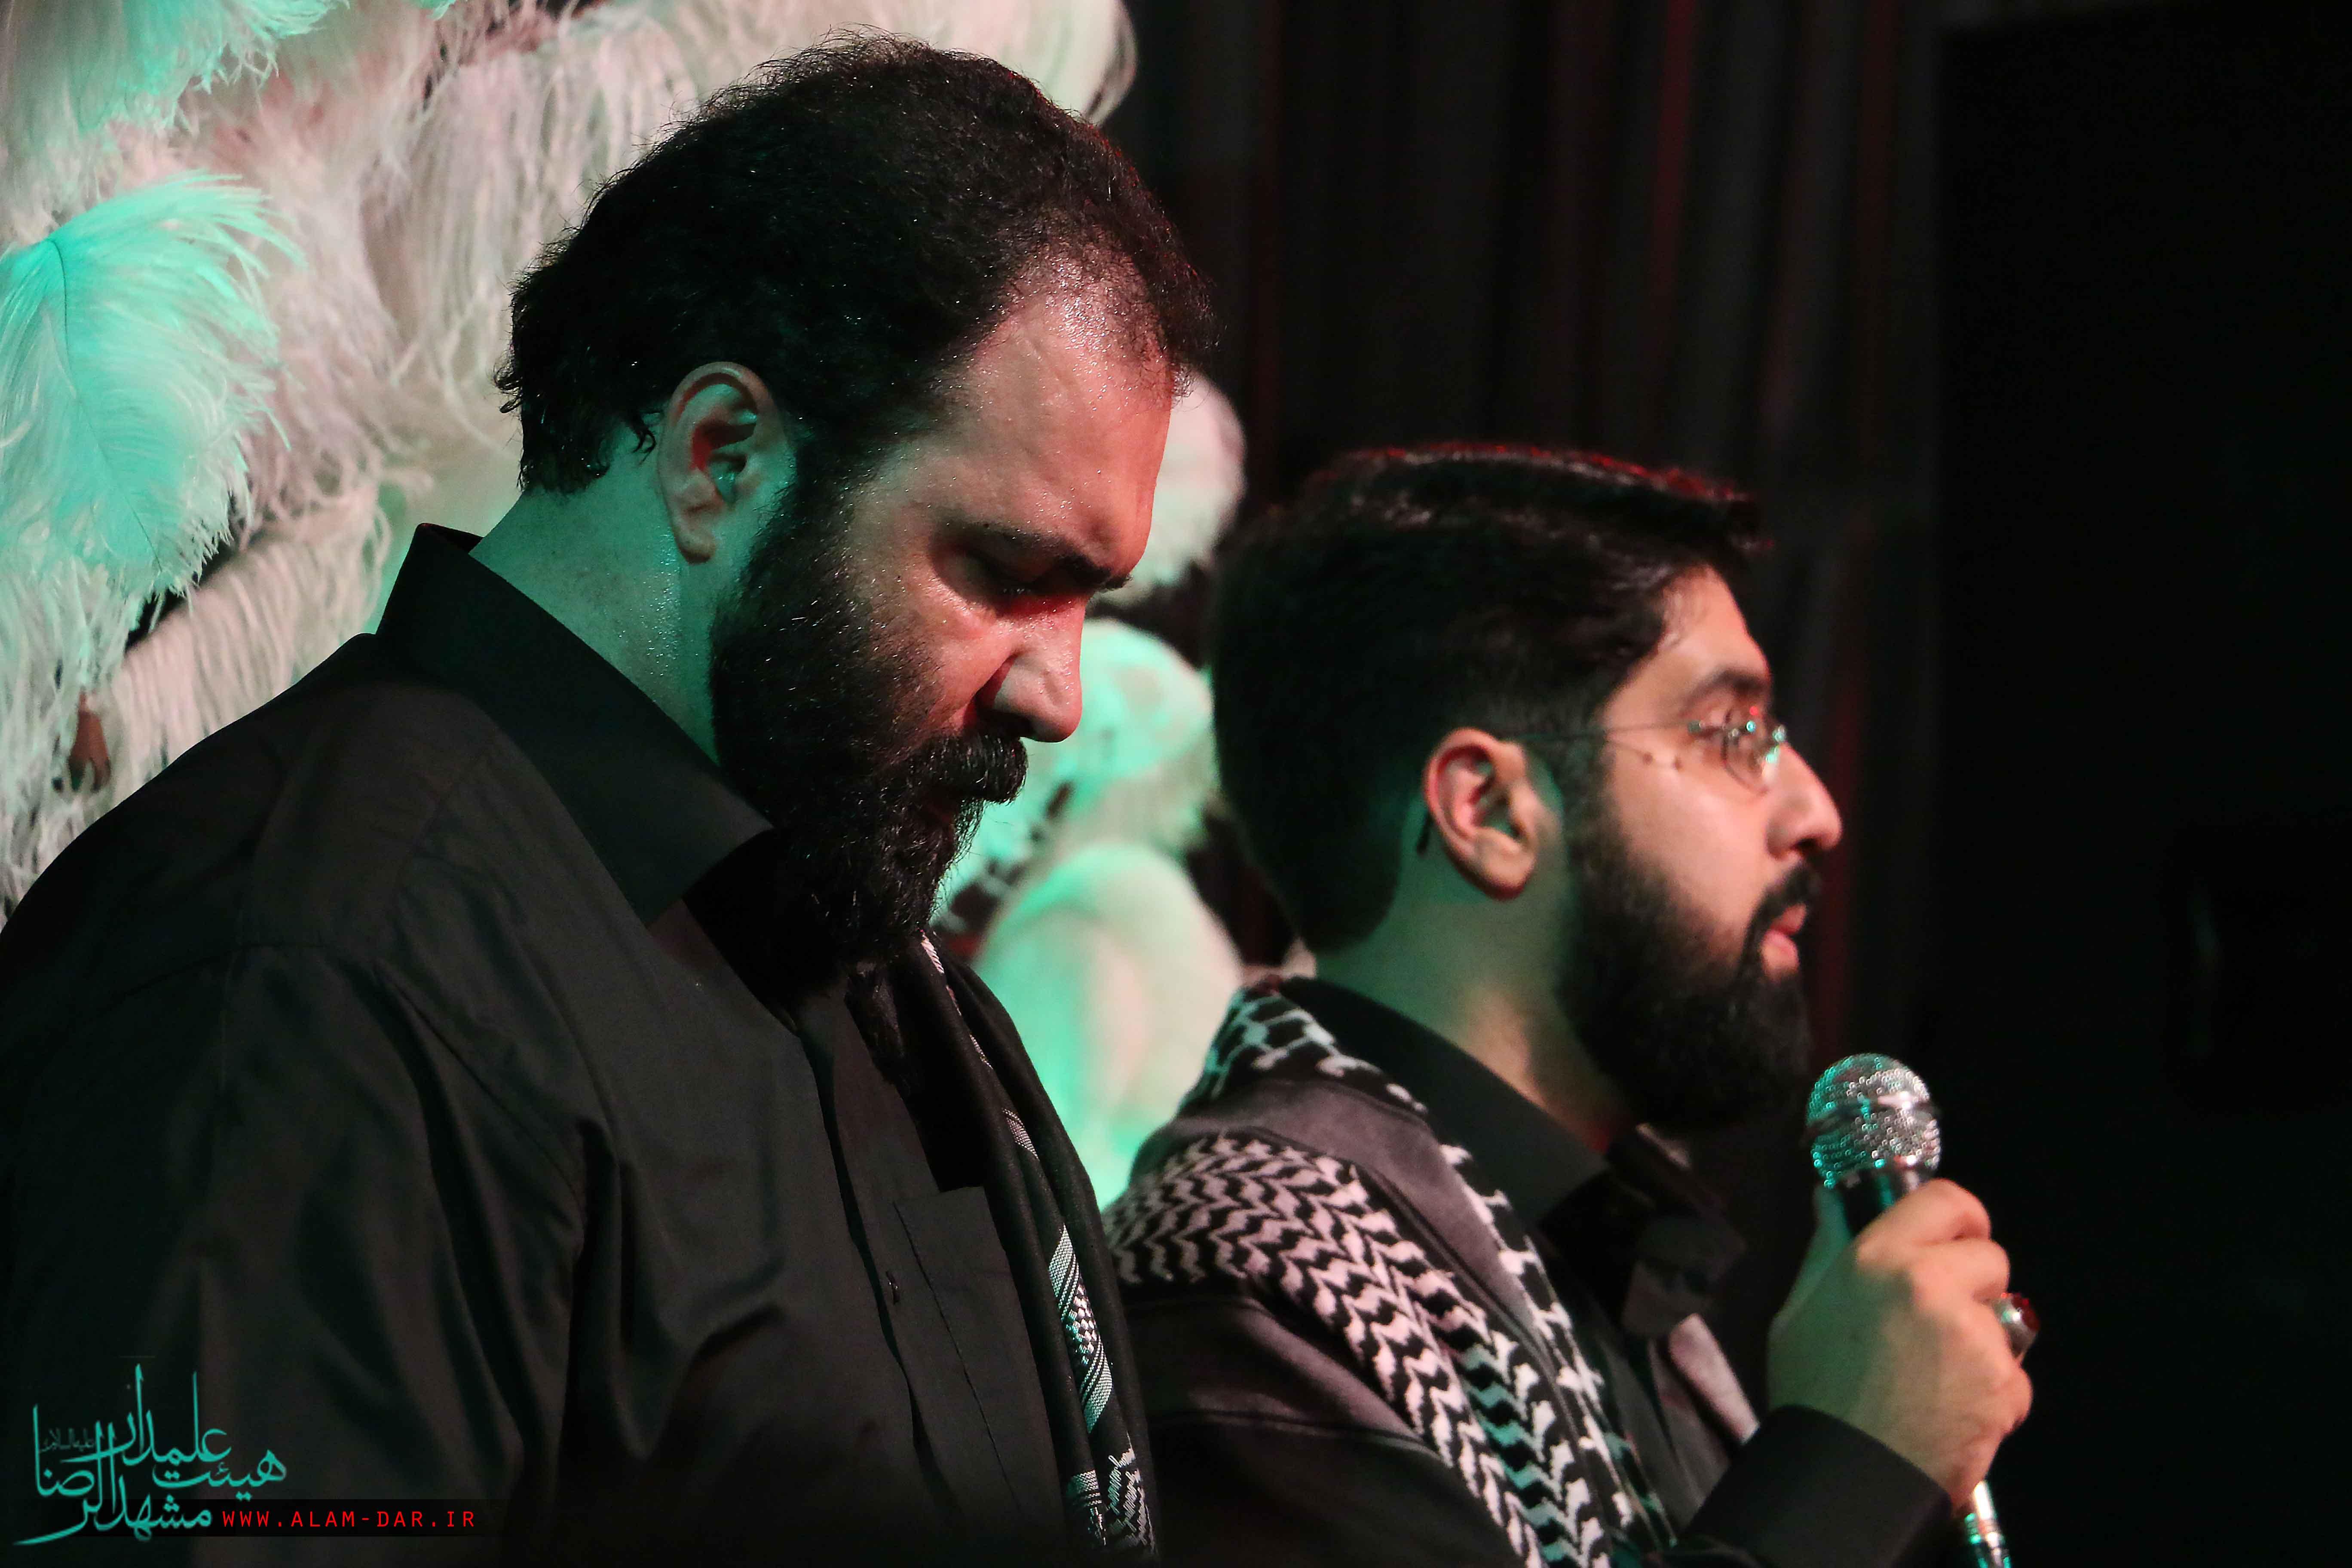 http://bayanbox.ir/view/3388648799337087187/shab-1-moharam-94-heiat-alamdar.jpg